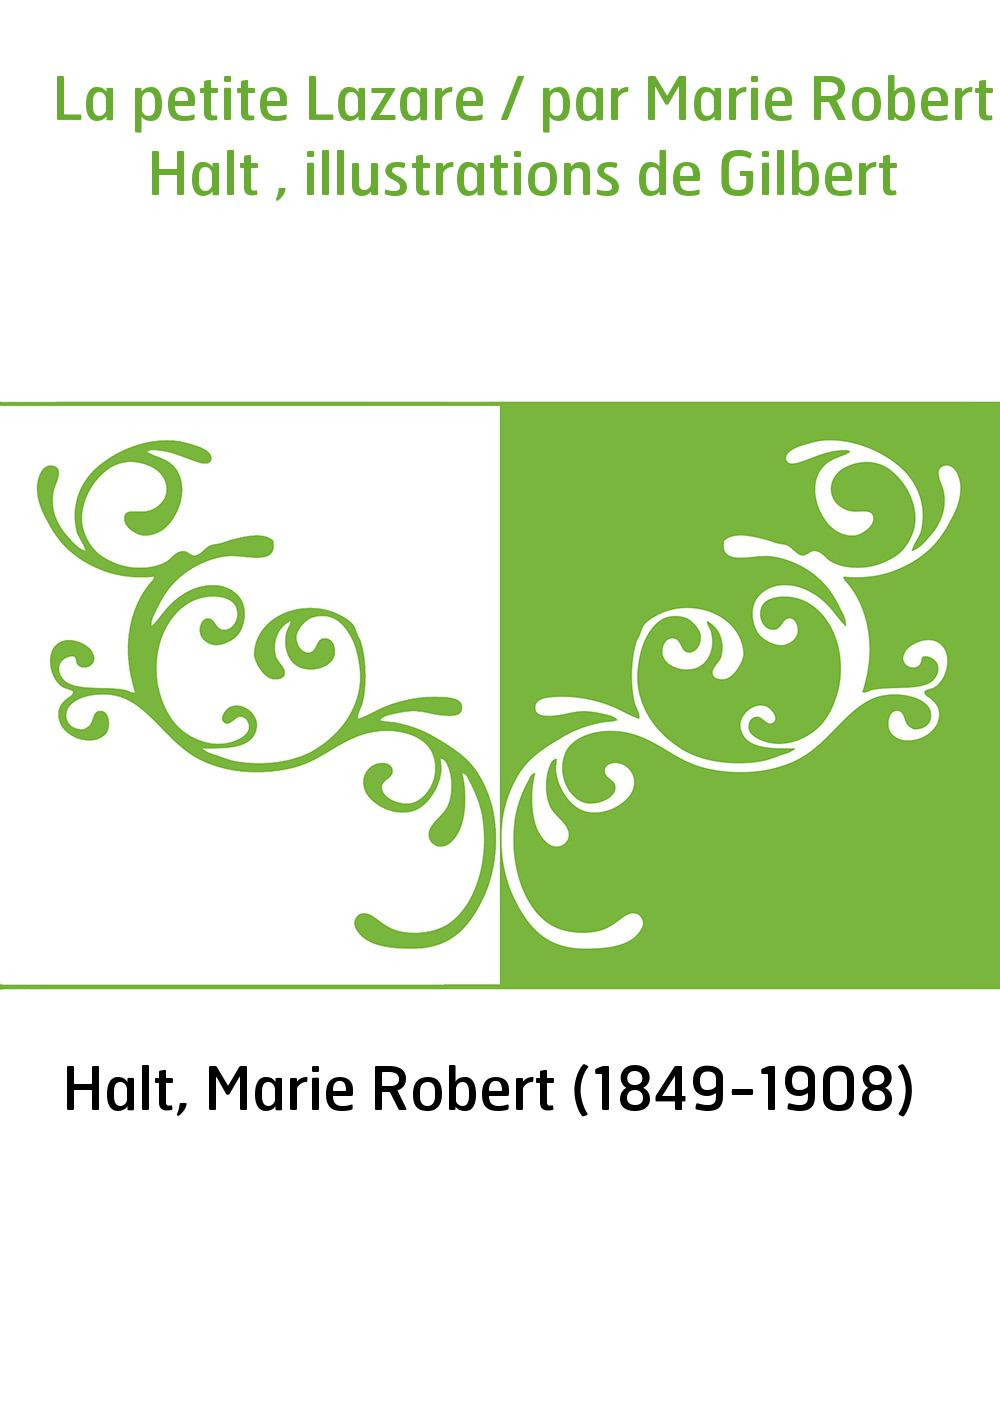 La petite Lazare / par Marie Robert Halt , illustrations de Gilbert